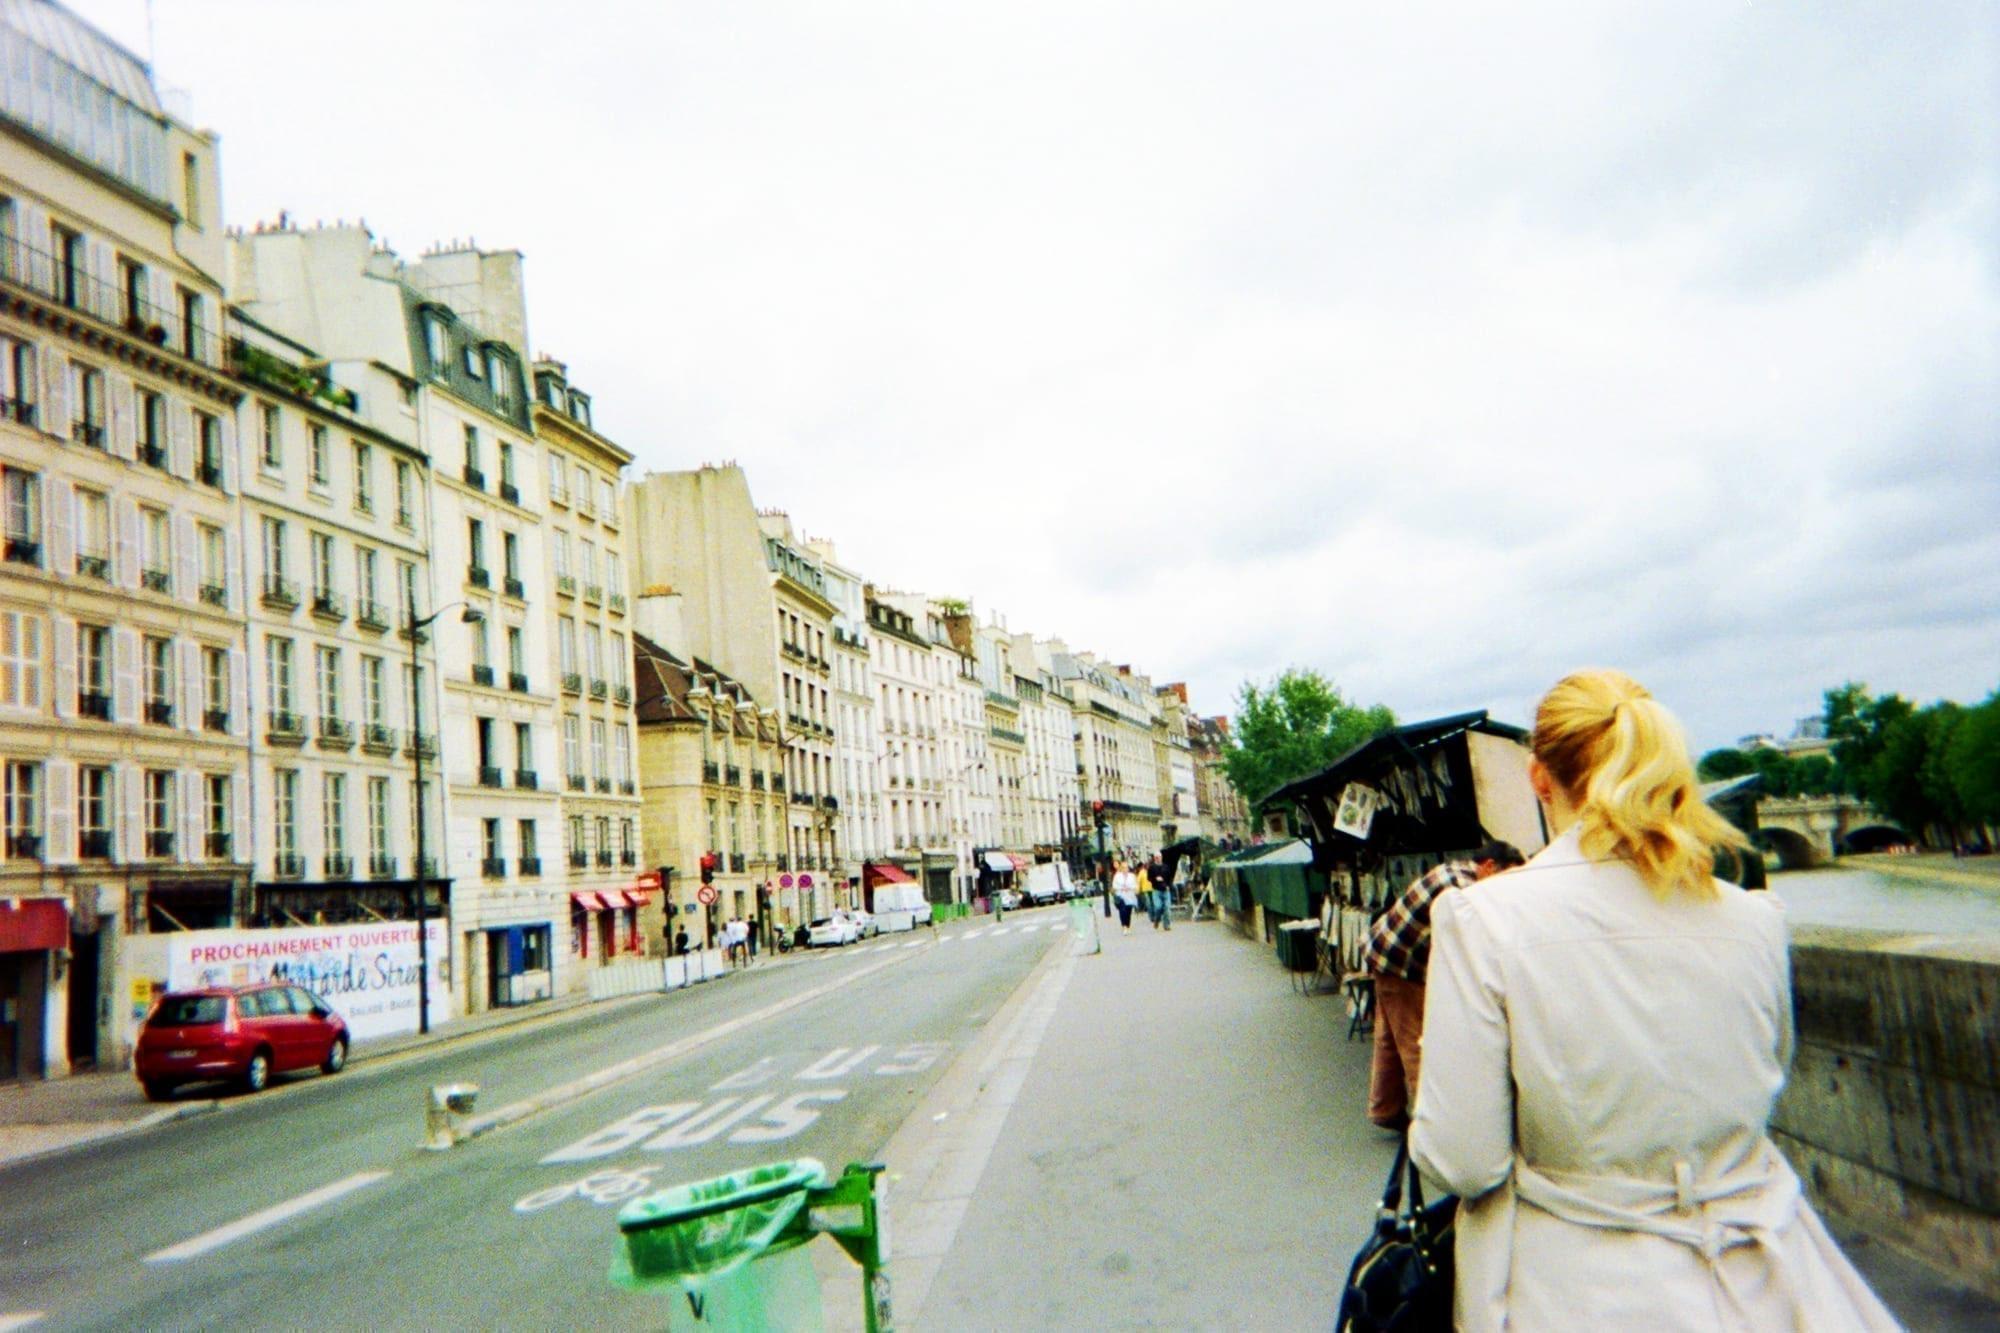 paris street european trip planner map